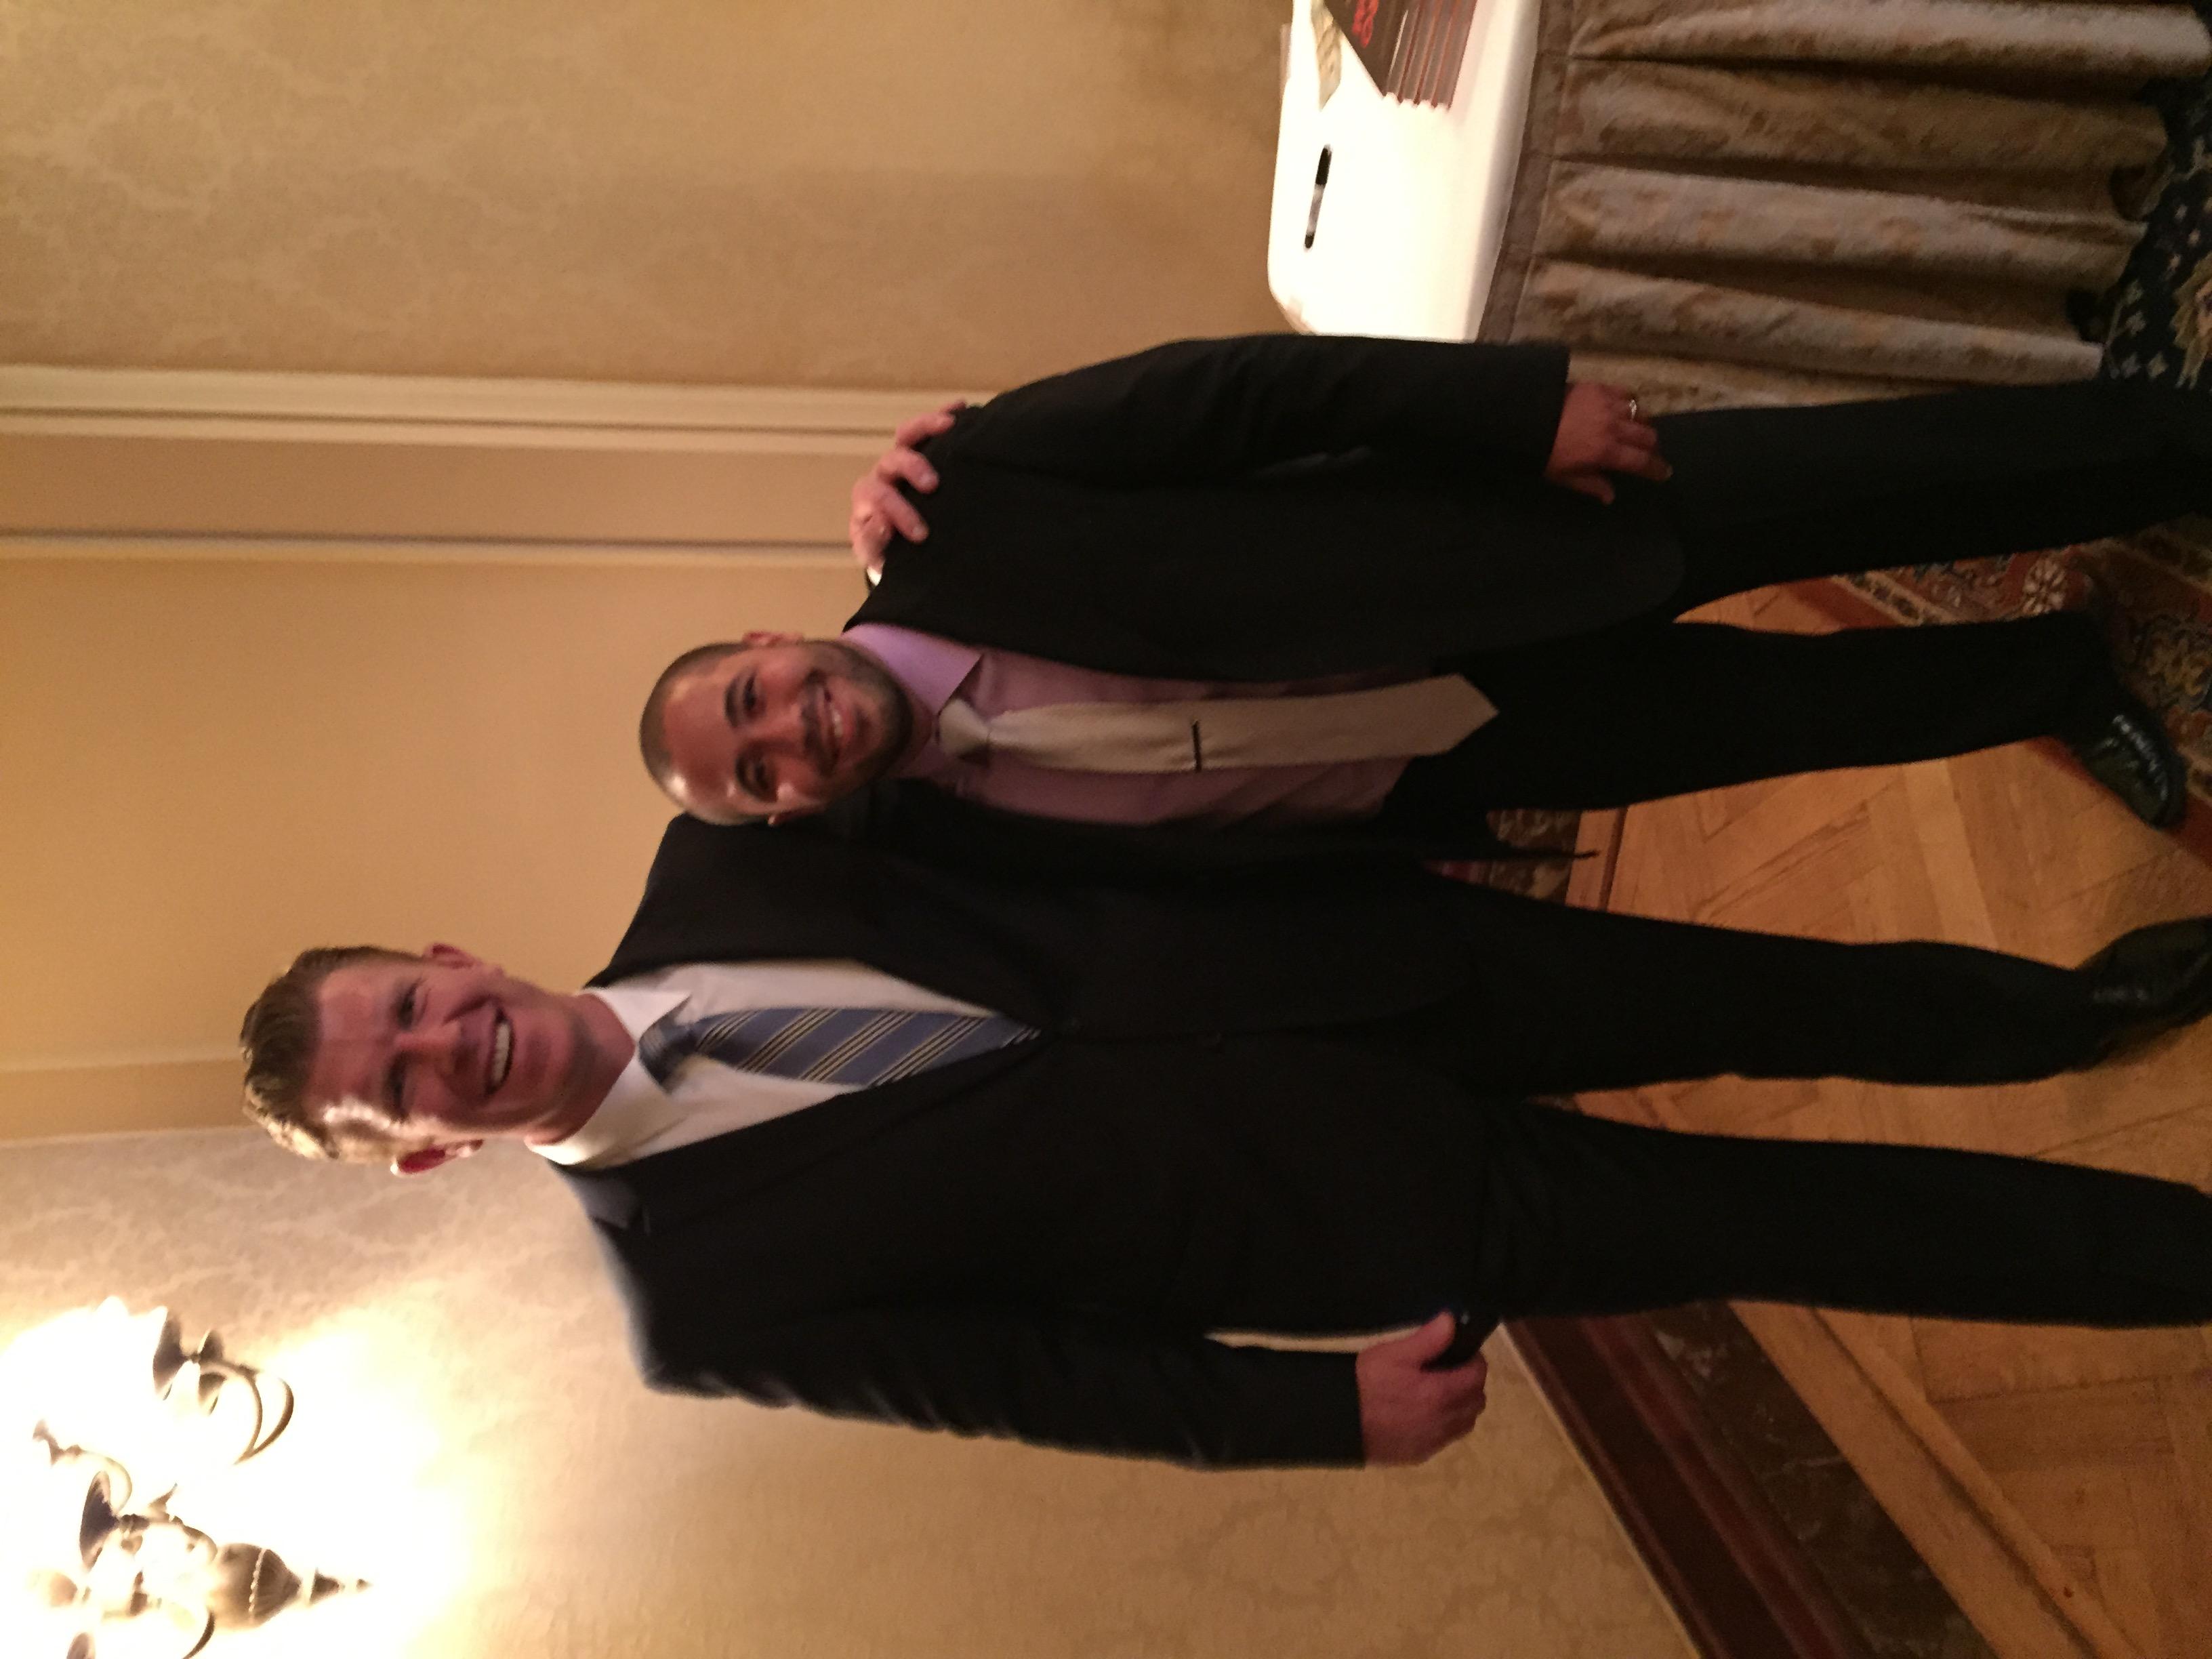 Matt Birk with Mission Director Jimmy Abreu